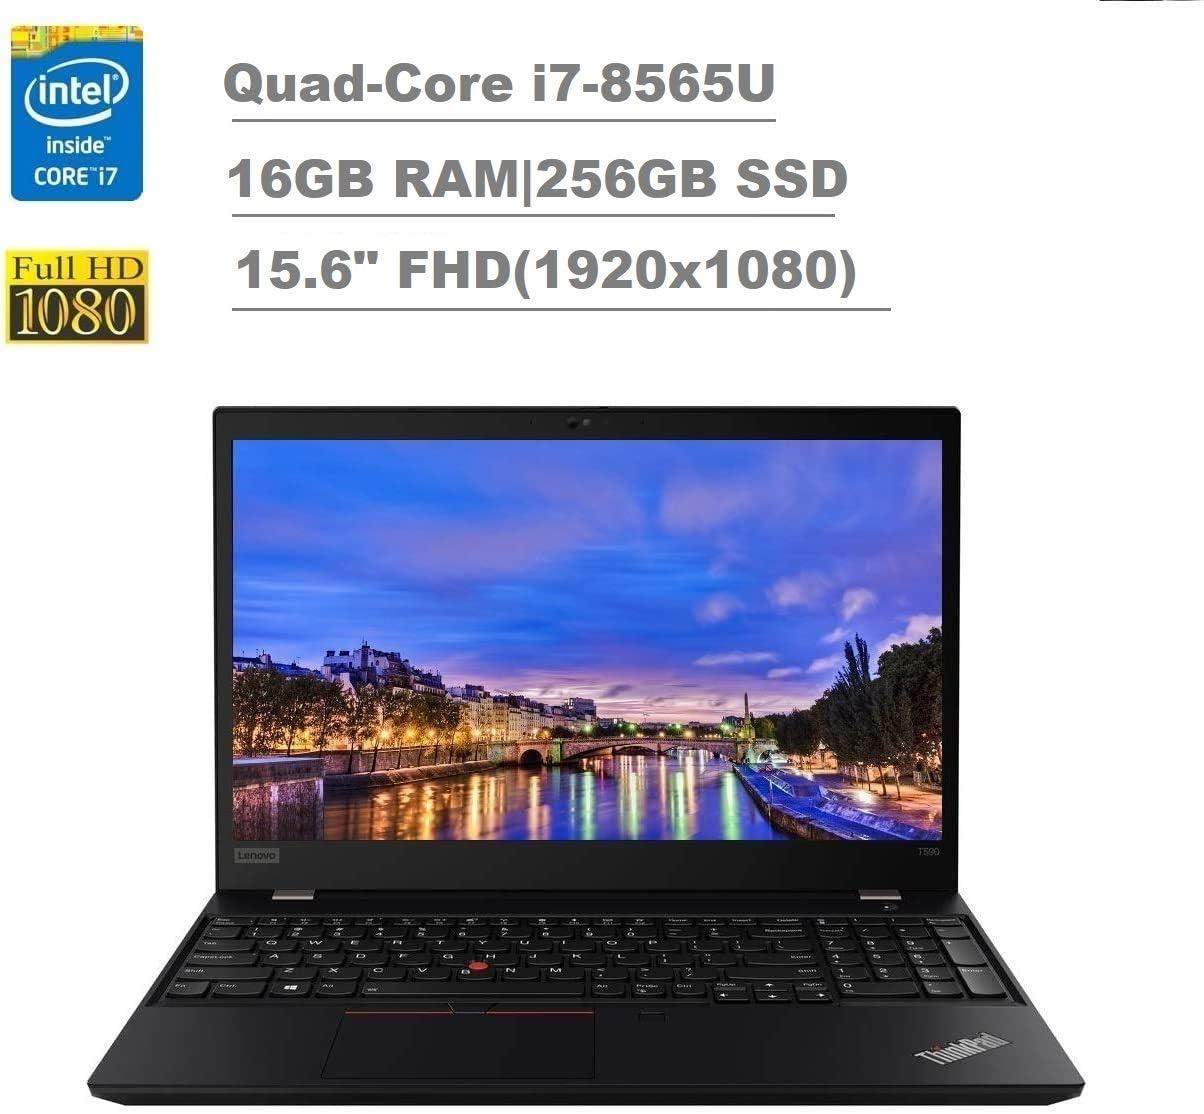 "2020 Lenovo ThinkPad T590 15.6"" FHD Full HD (1920x1080) Business Laptop (Intel Quad-Core i7-8565U, 16GB RAM, 256GB SSD) Backlit, Type-C Thunderbolt 3, RJ-45, Webcam, Windows 10 Pro IST Computers"